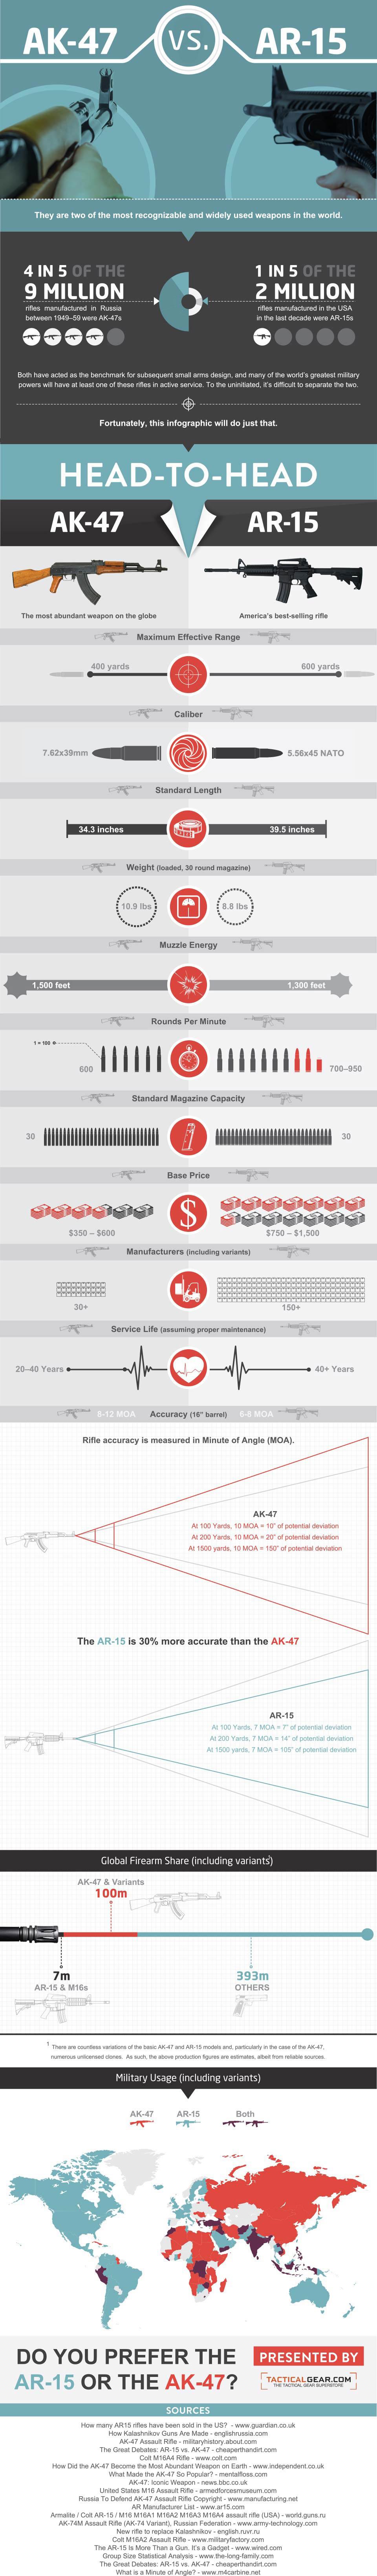 ar15vsak47-infographic